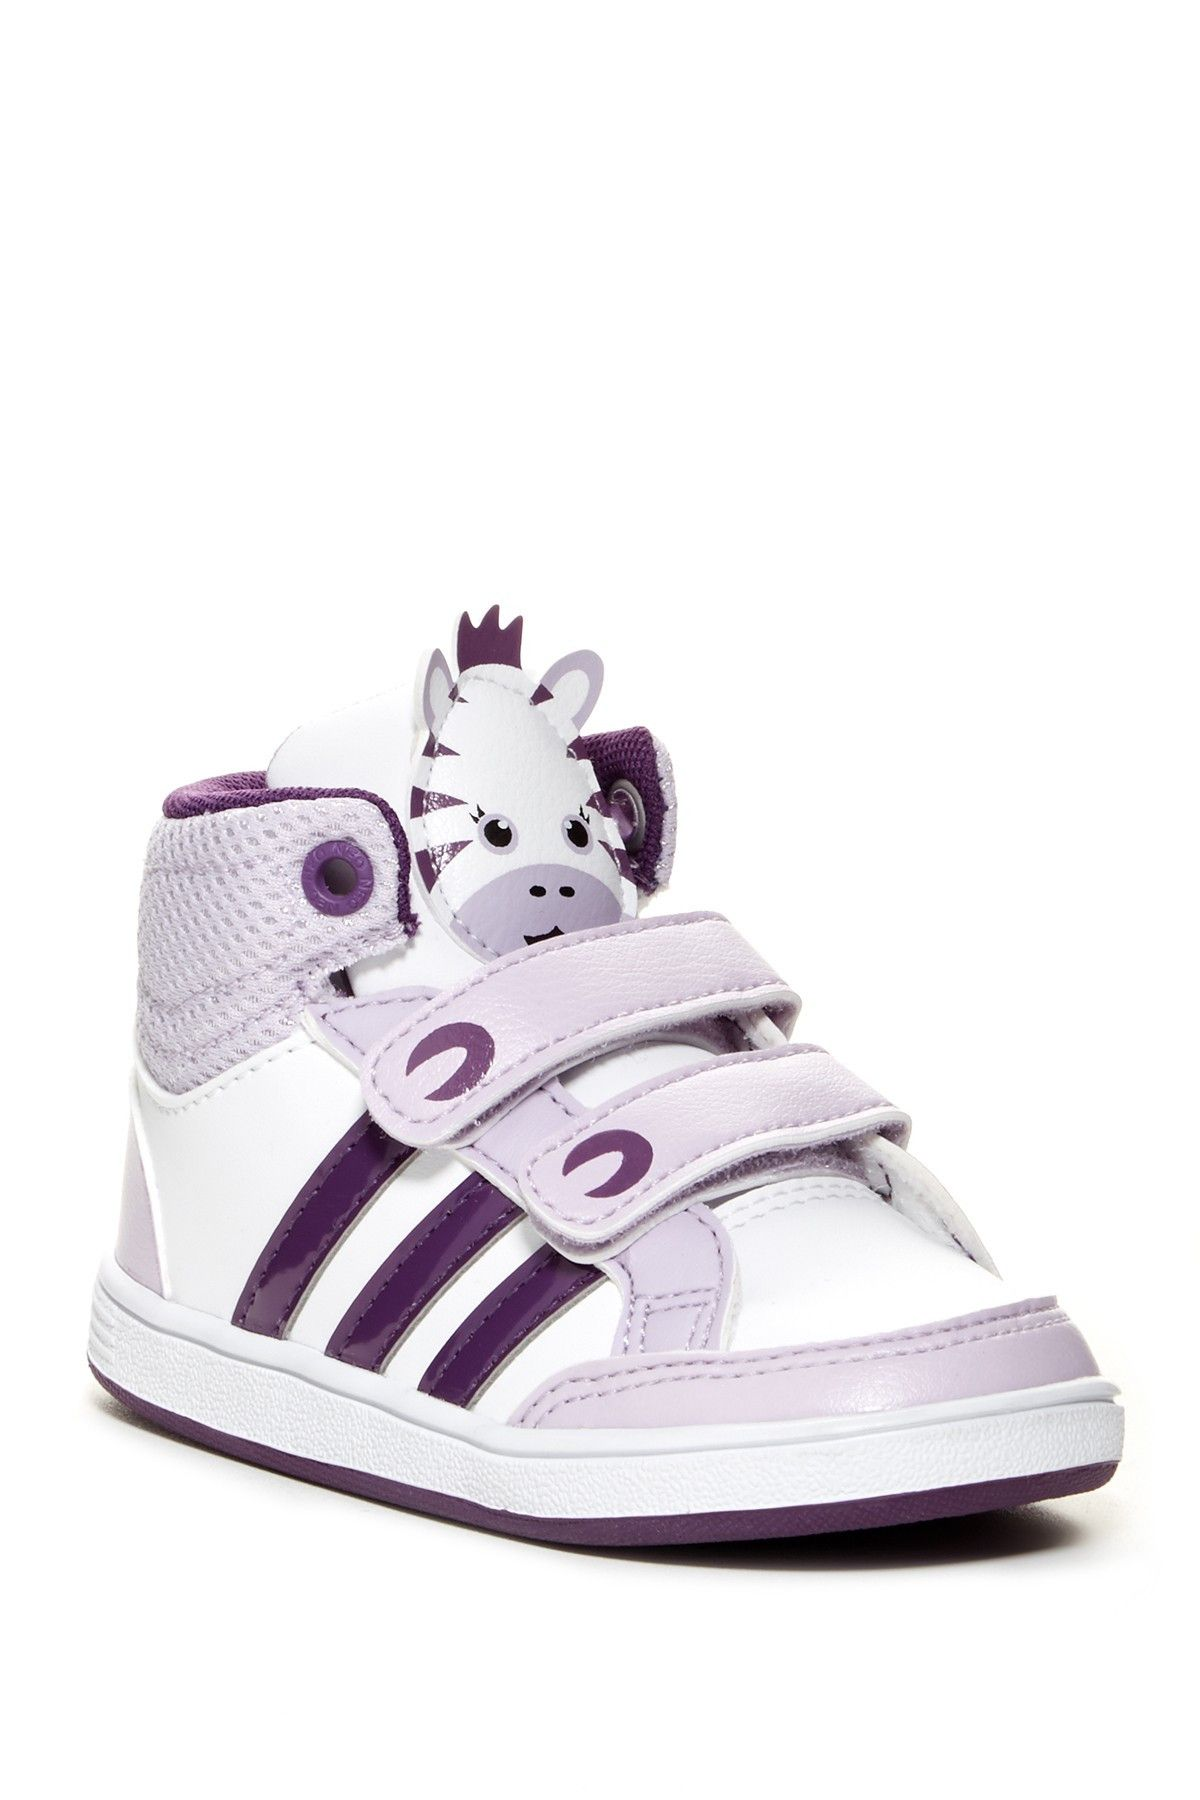 adidas high tops kids purple cheap >off62% più grande catalogo